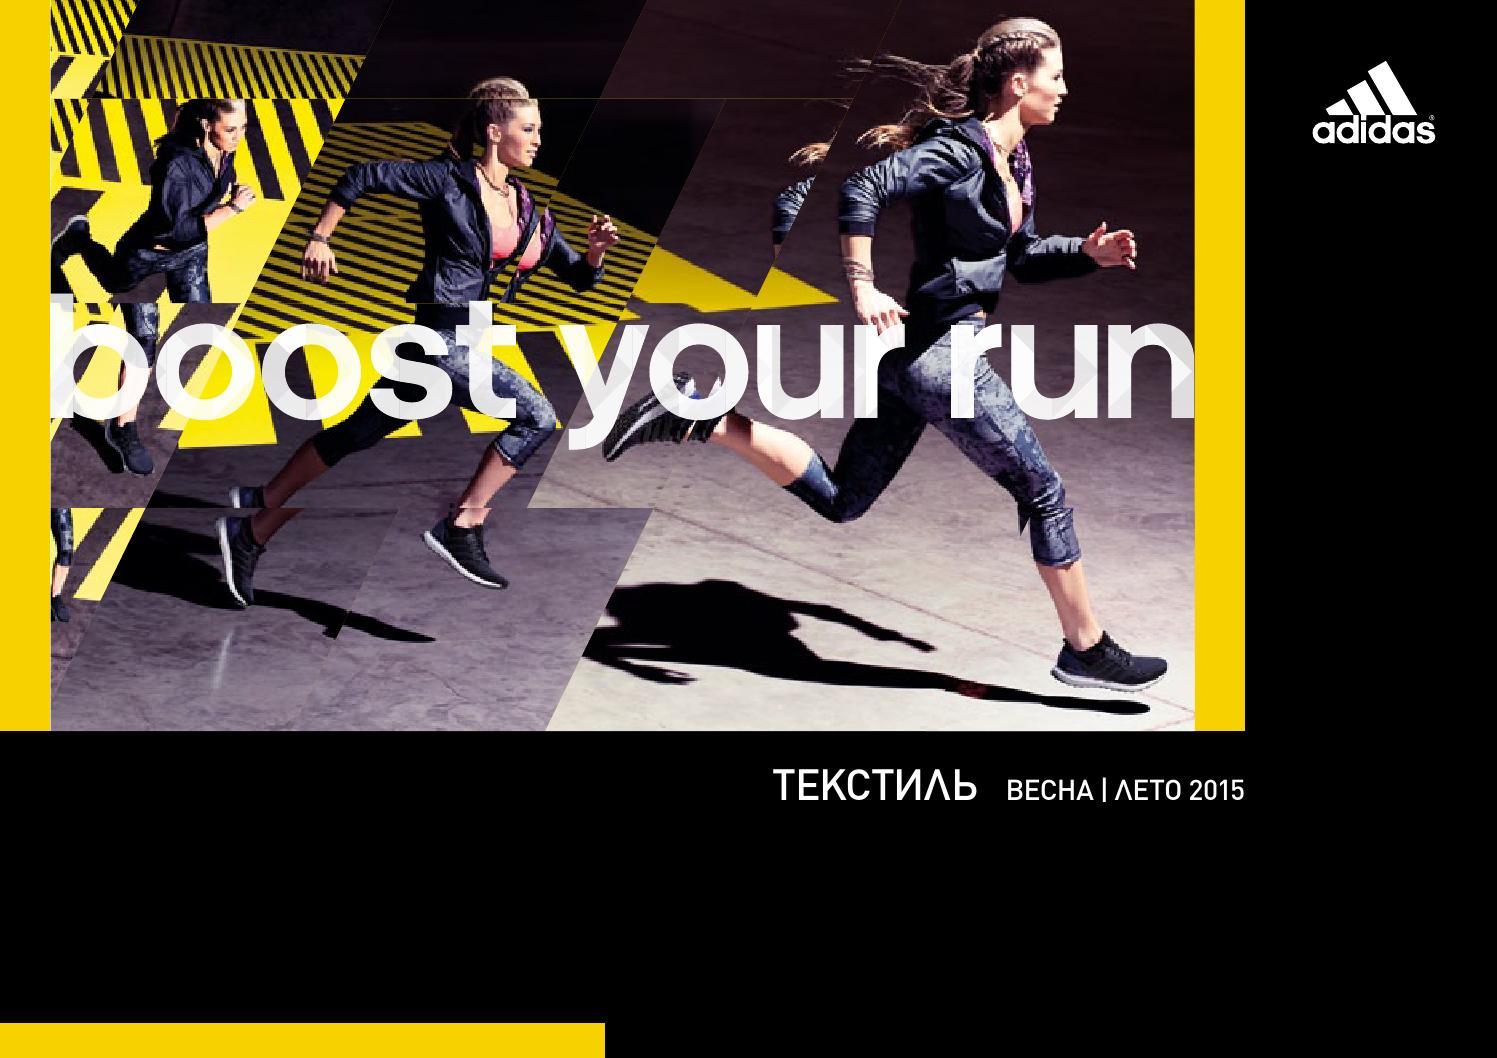 d1e28b385bd3 Adidas textile 2015 by Maverick Zen - issuu